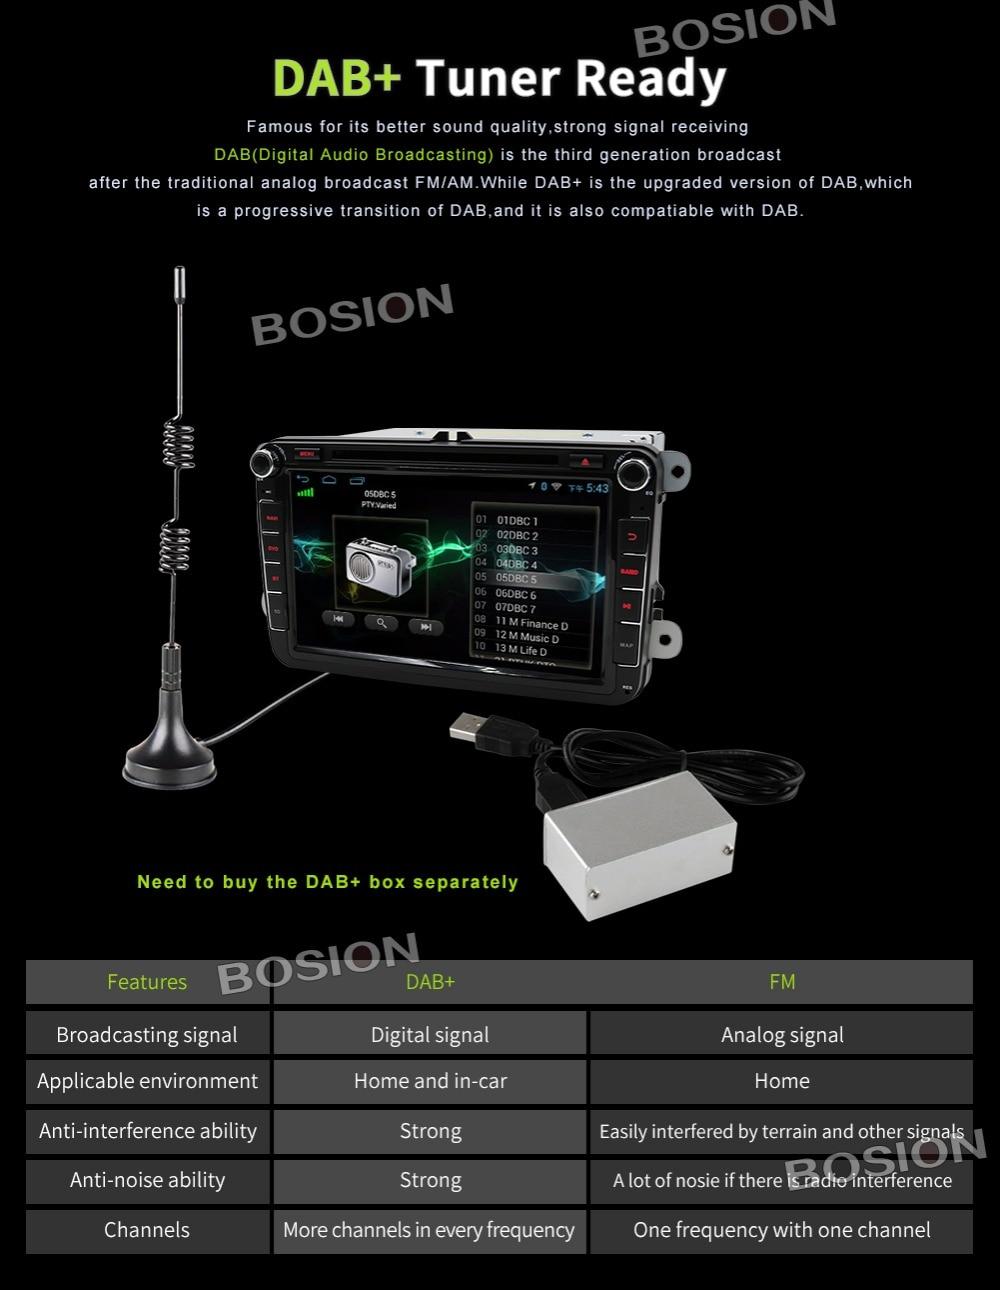 8 Inch 2din Android 71 Mobil Dvd Player 4 Core Untuk Vw Music Jumping Animal Binatang Rusa Karet Musik Ampamp Lampu 5402 Htb11jxvdxuwbunjsspnq6x1nvxaq